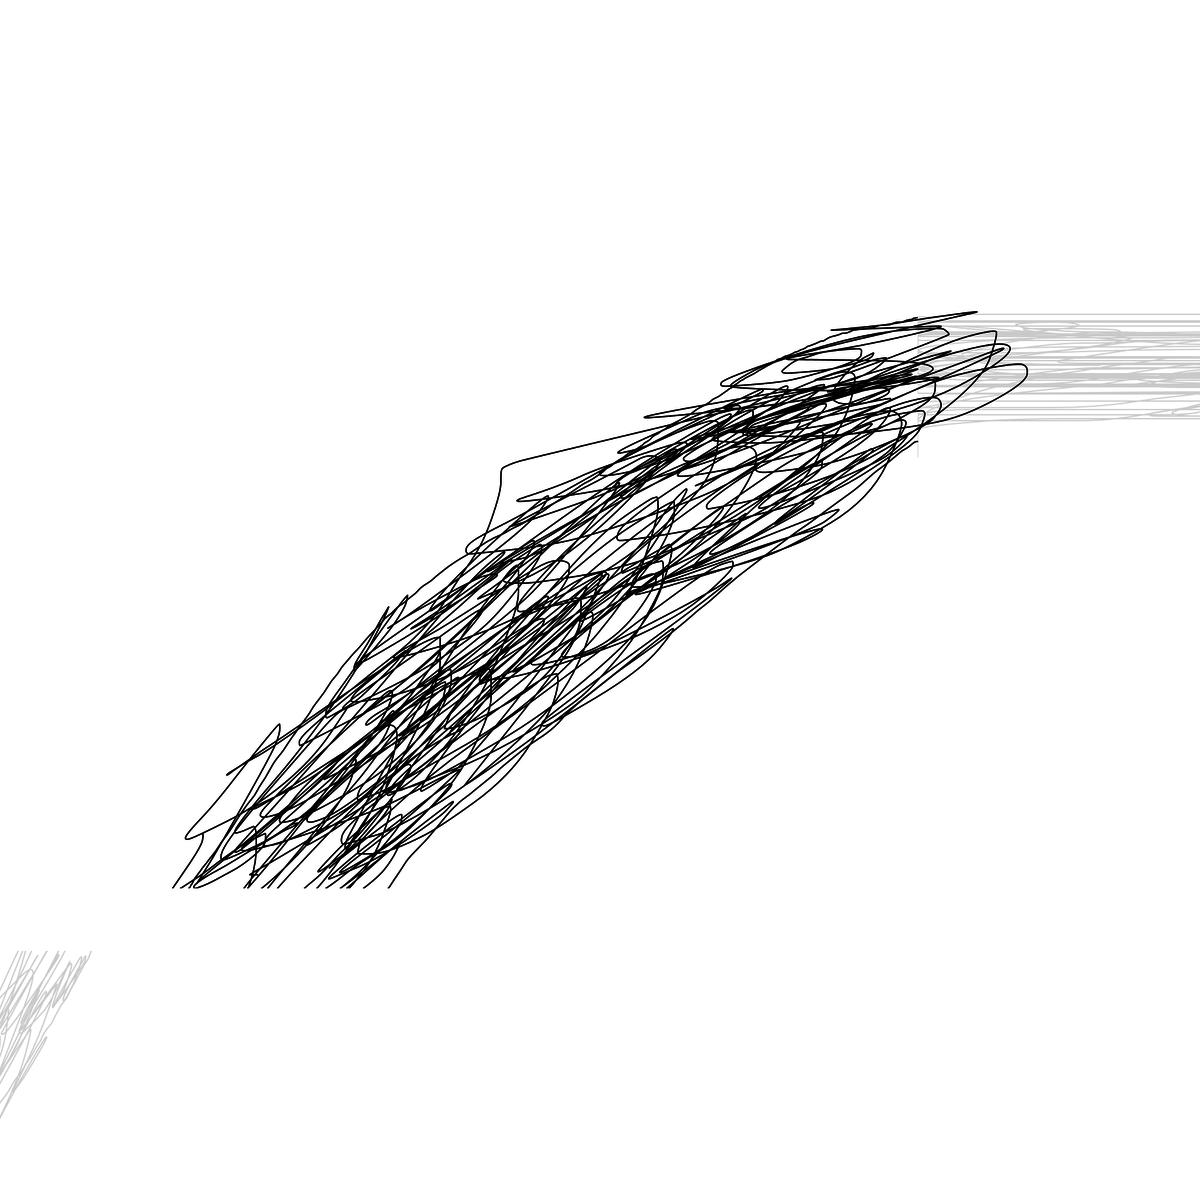 BAAAM drawing#11451 lat:52.4759941101074200lng: 13.4056091308593750